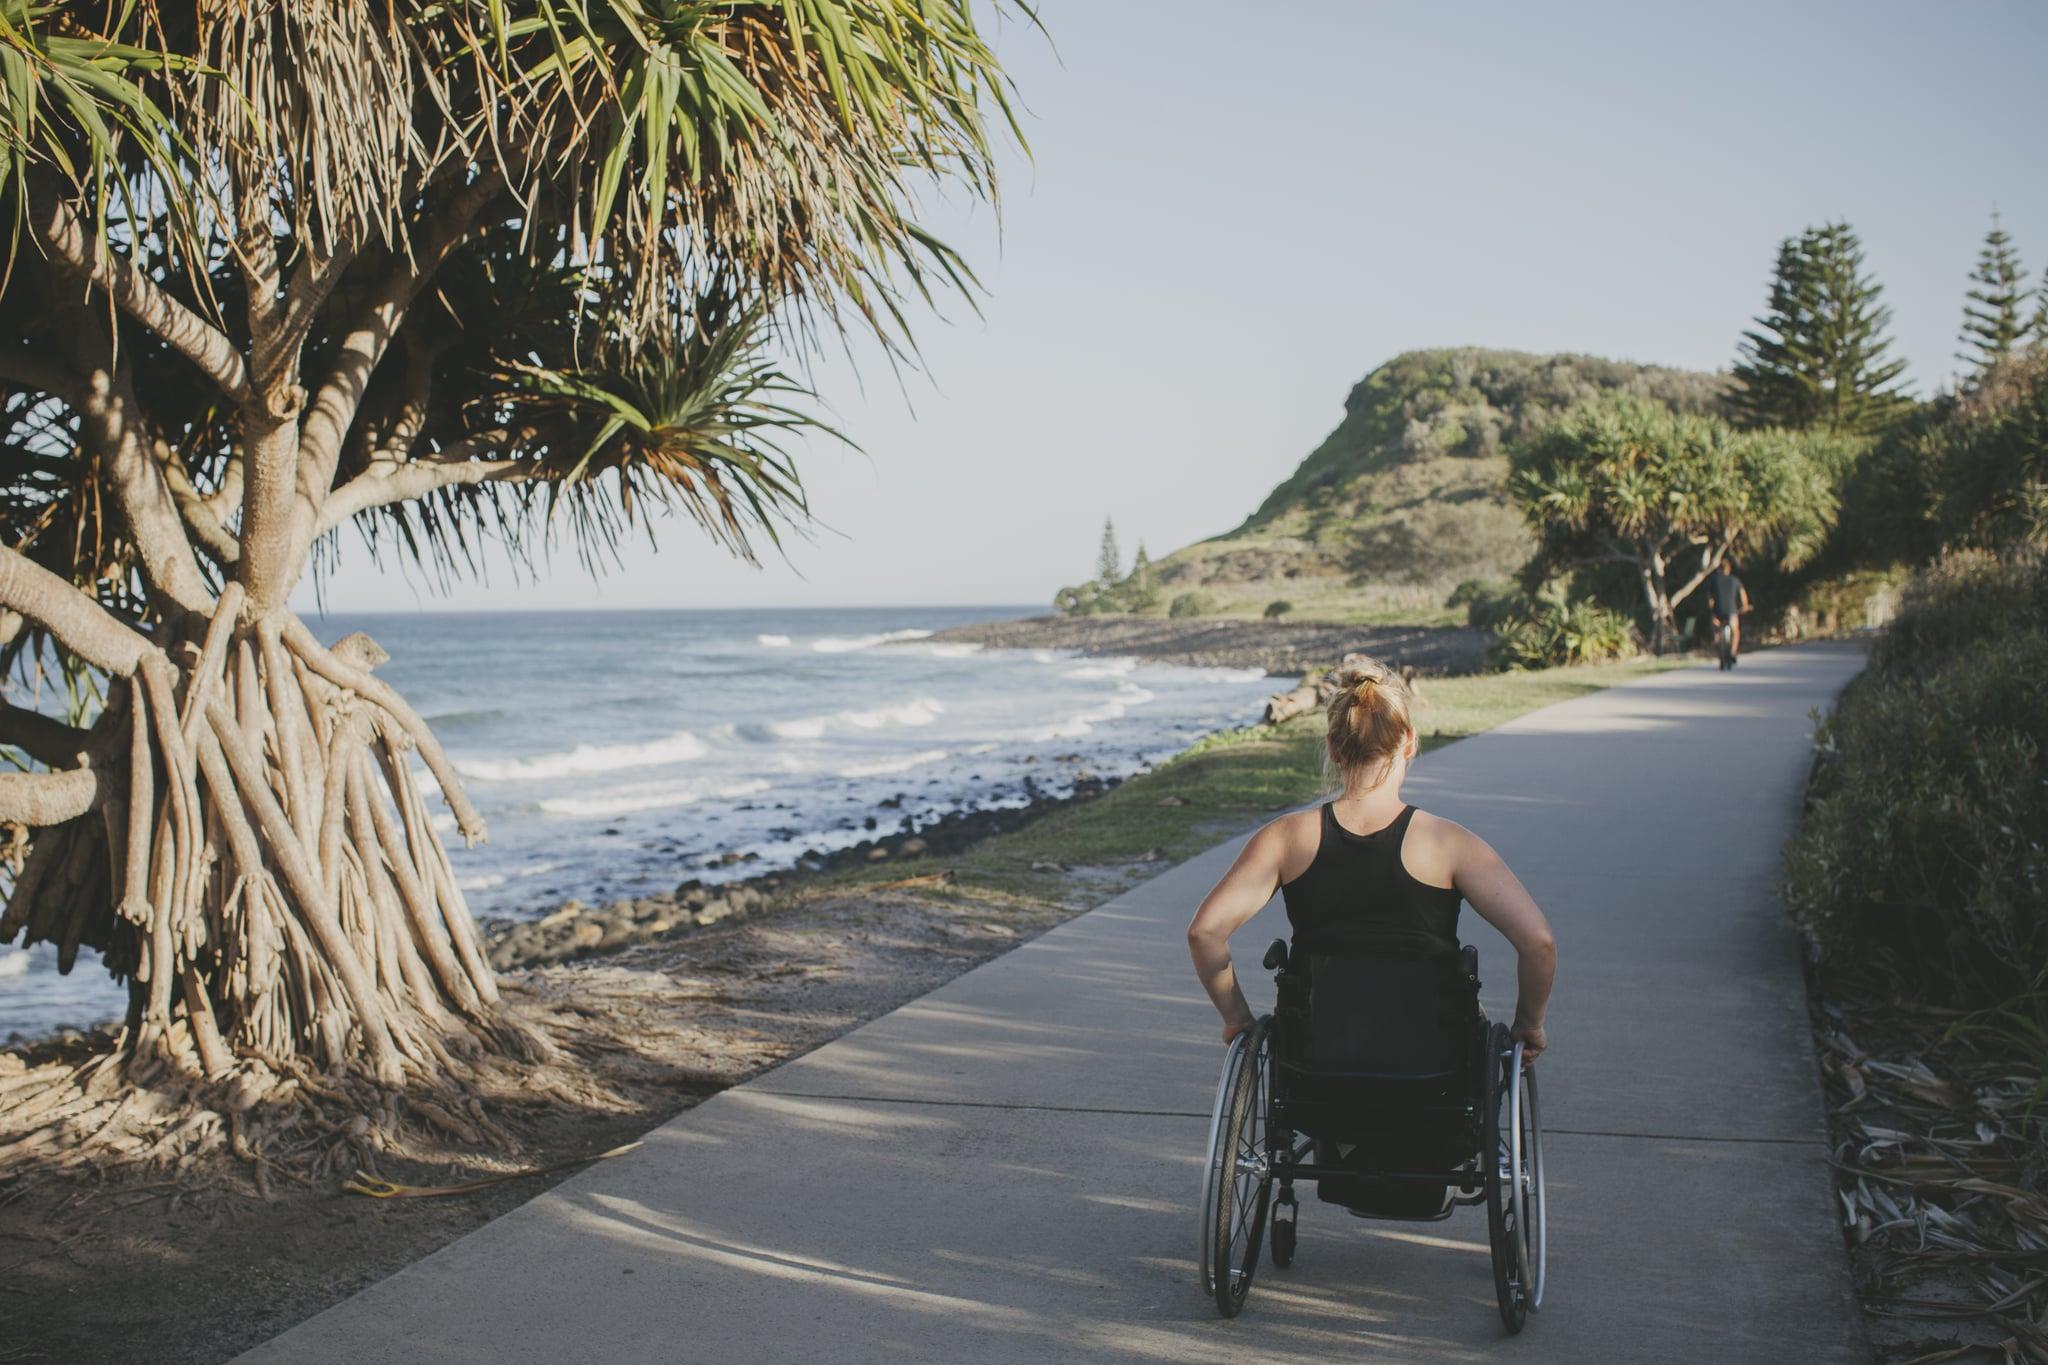 Paraplegic woman travelling in her wheelchair beside the ocean